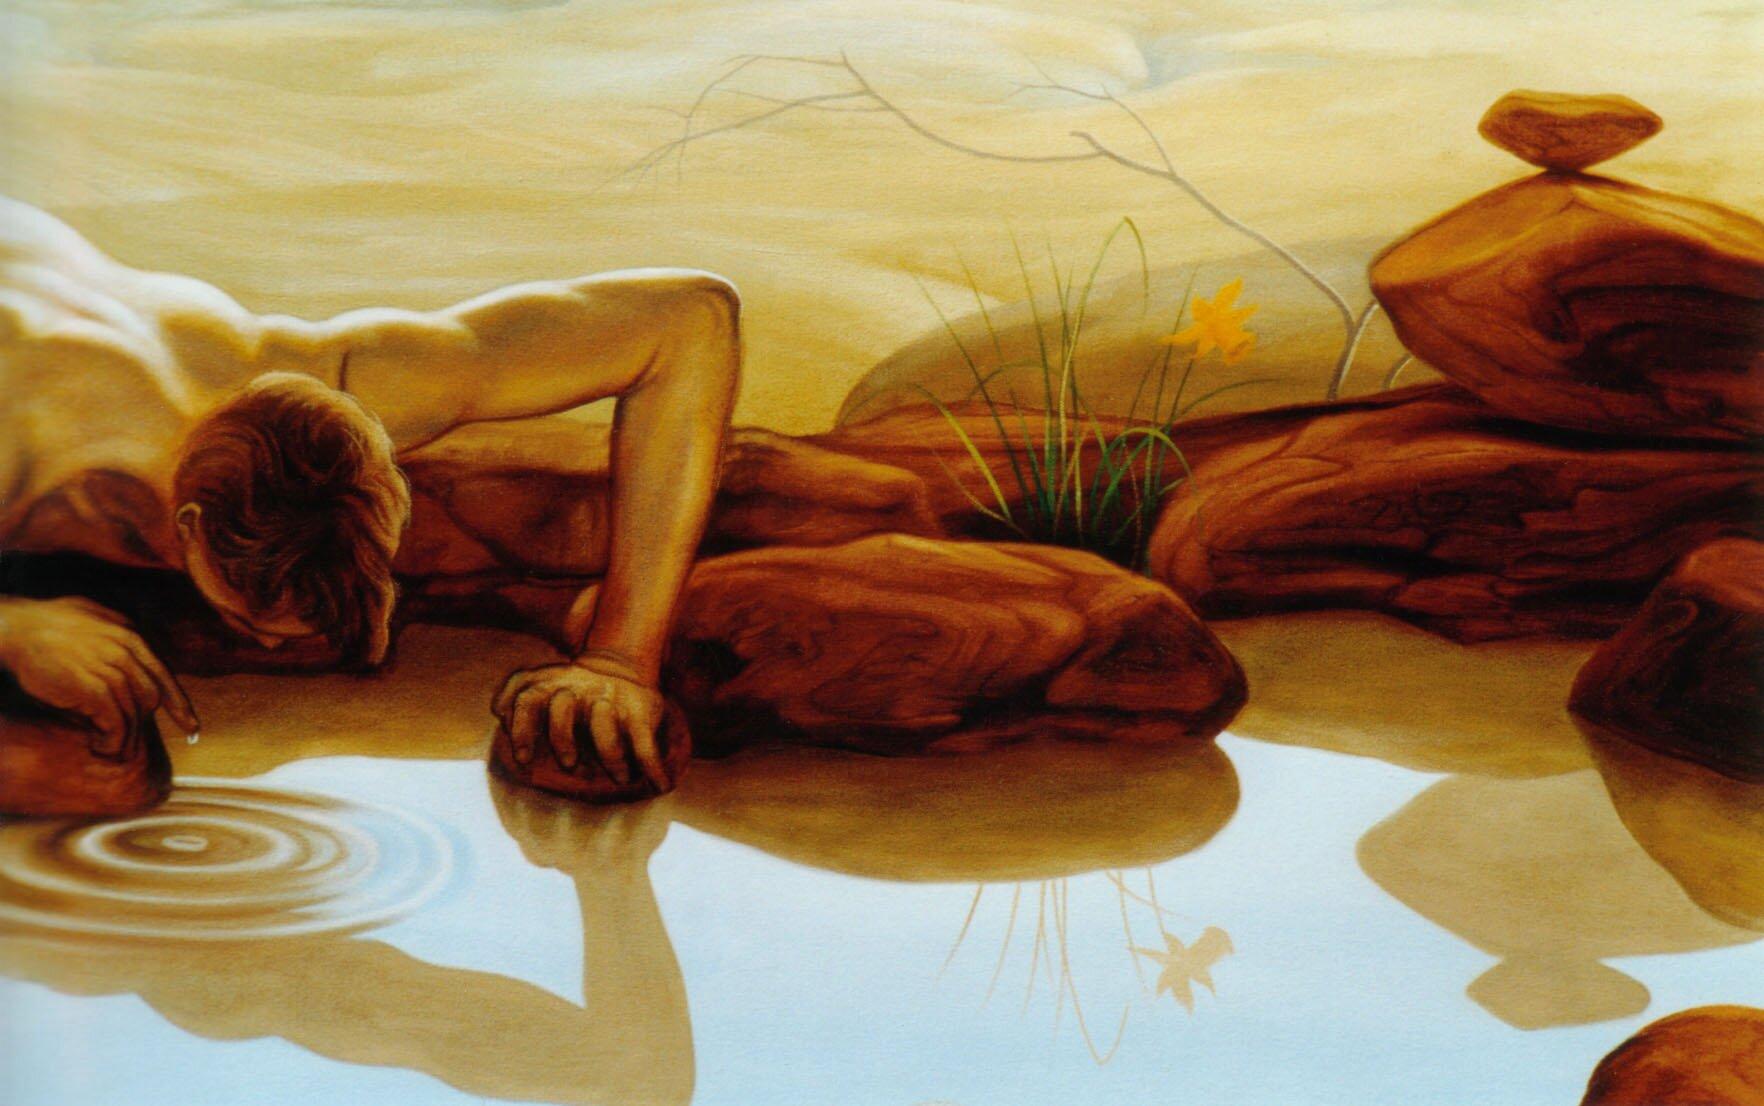 Richard Baxter - Narcissus and Echo (detal) Źródło: cea, Richard Baxter - Narcissus and Echo (detal), licencja: CC BY 2.0.